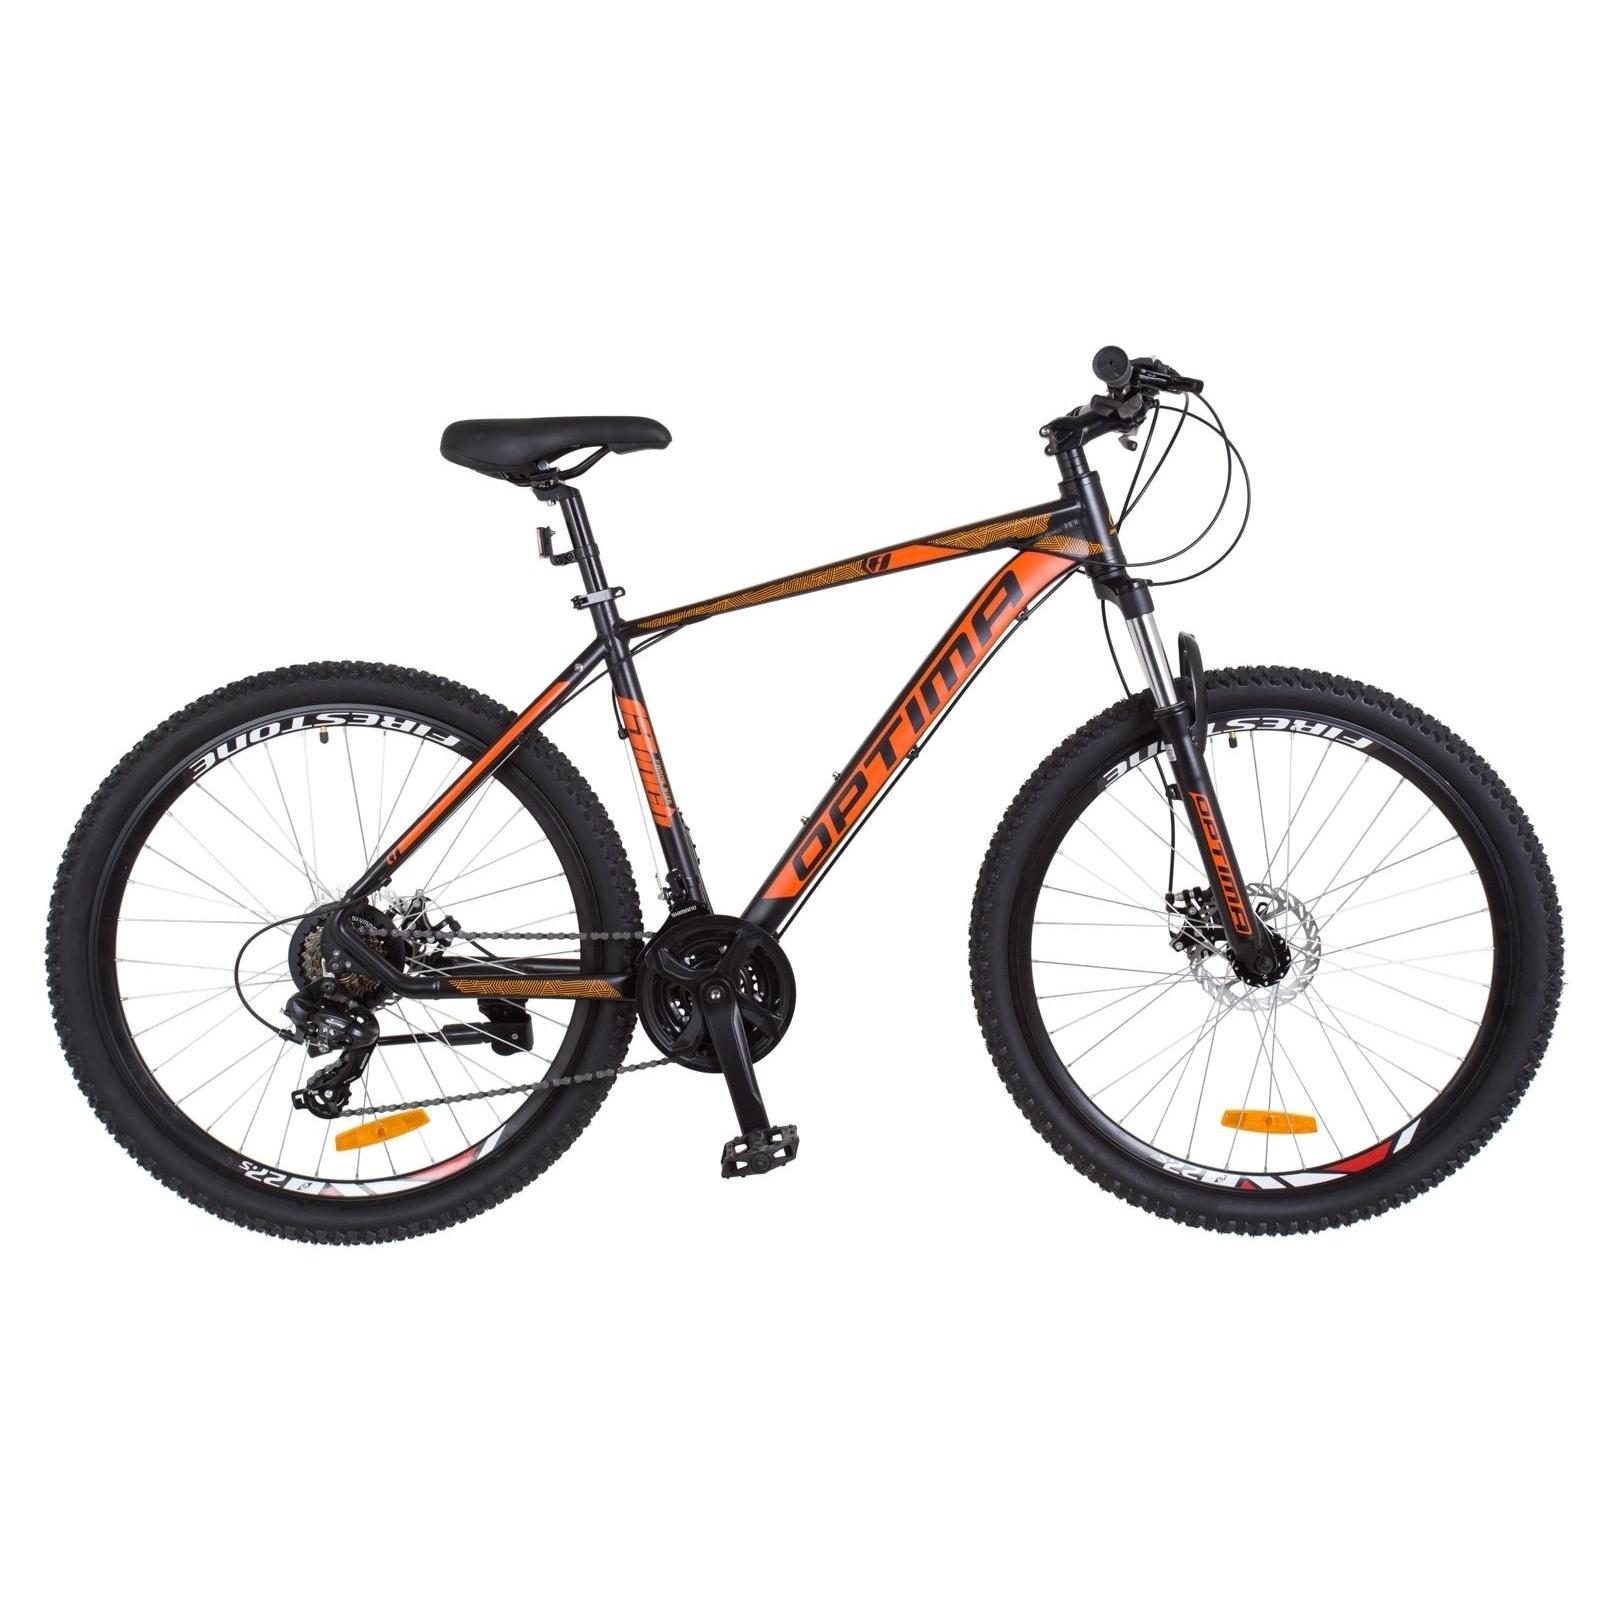 "Велосипед Optimabikes 29"" F-1 2018 AM 14G DD рама-19"" Al черно-оранжевый (OPS-OP-29-047)"